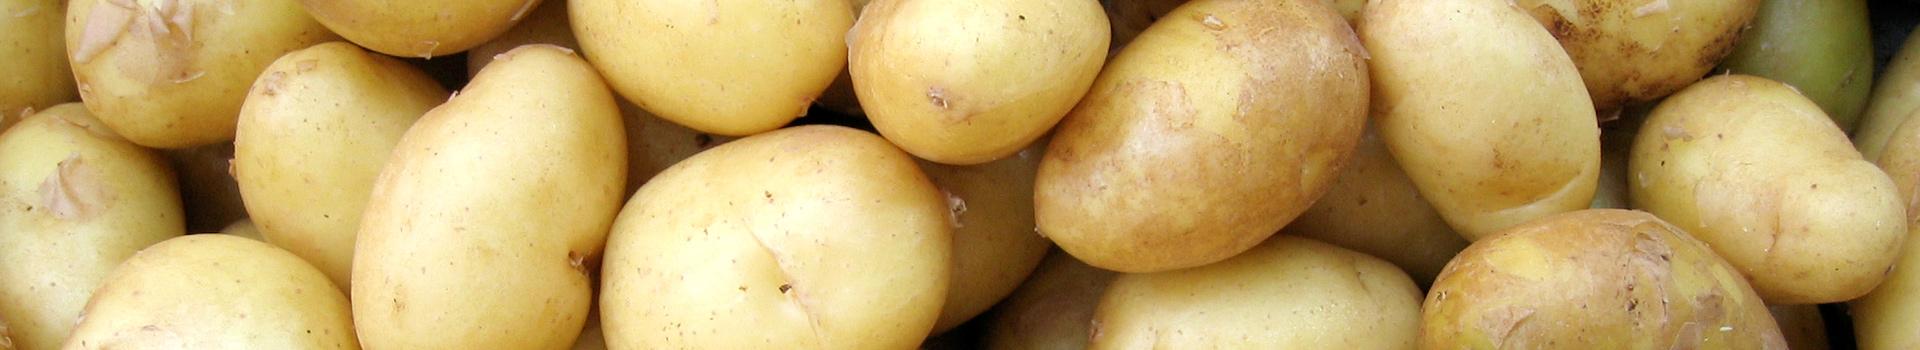 Maquinaria cortada de patatas